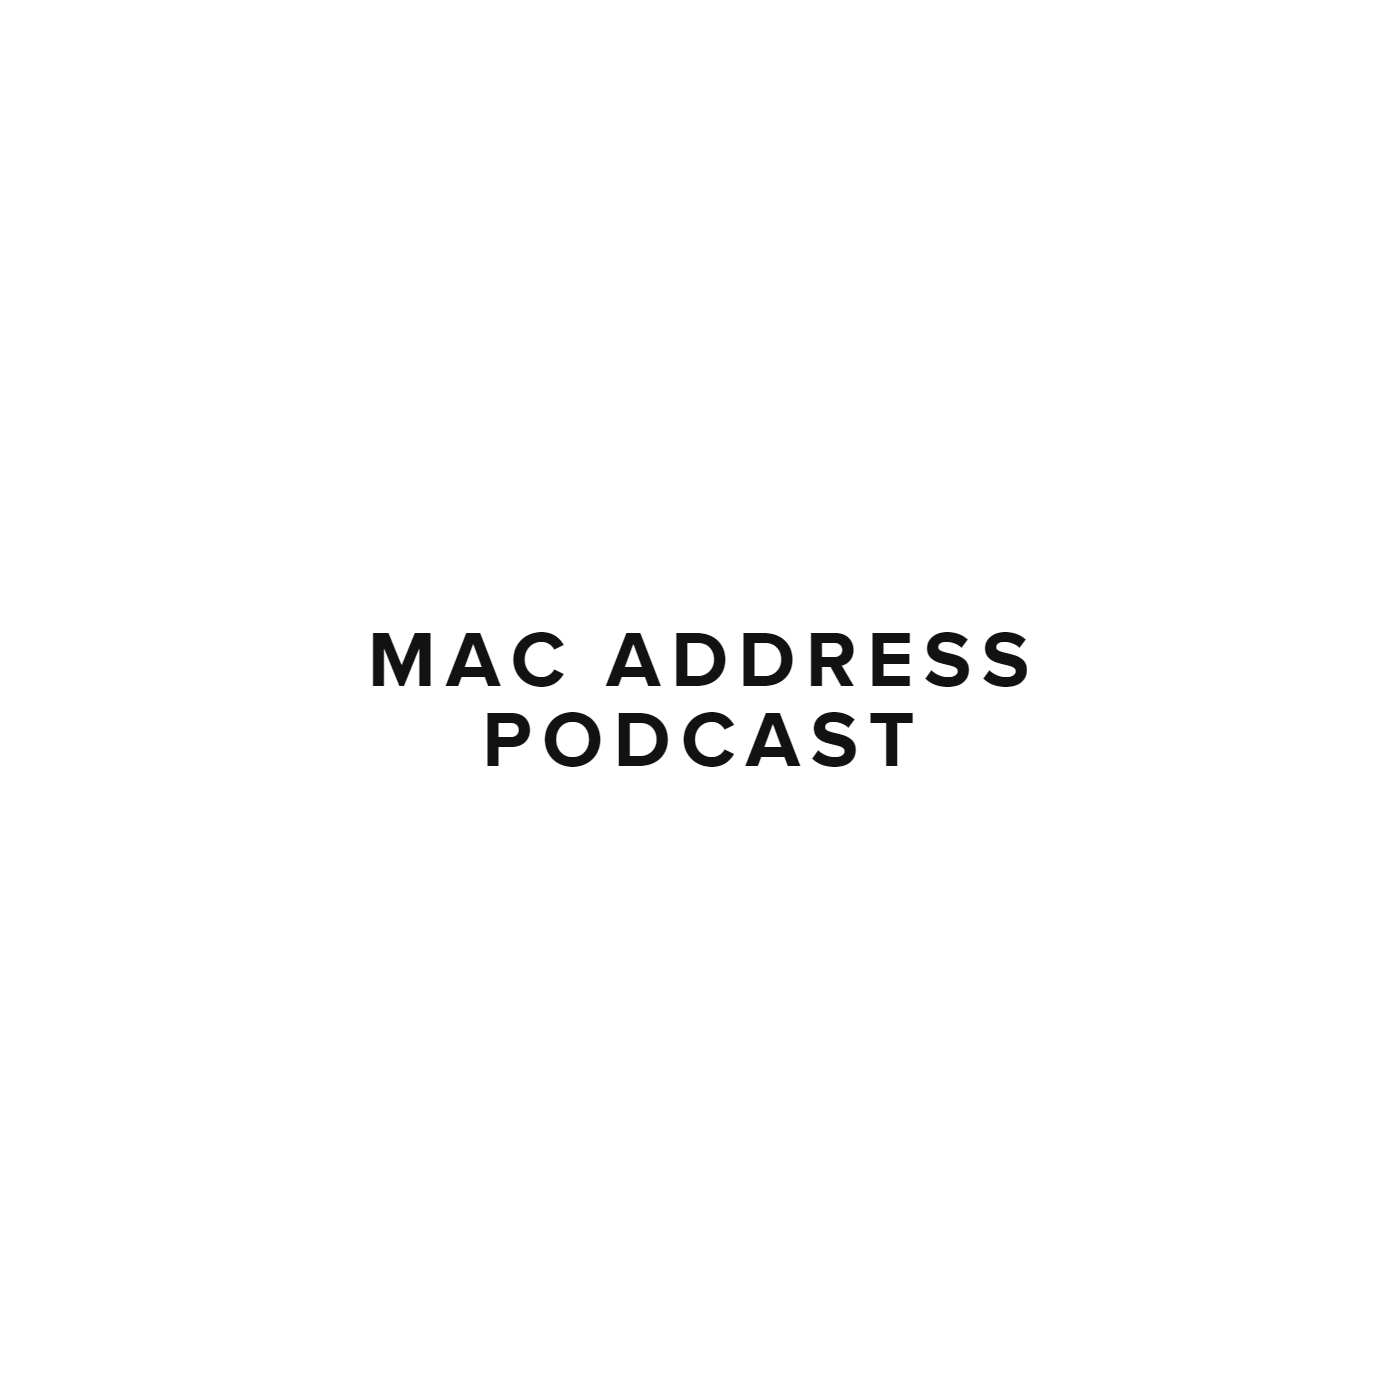 MAC Address Podcast